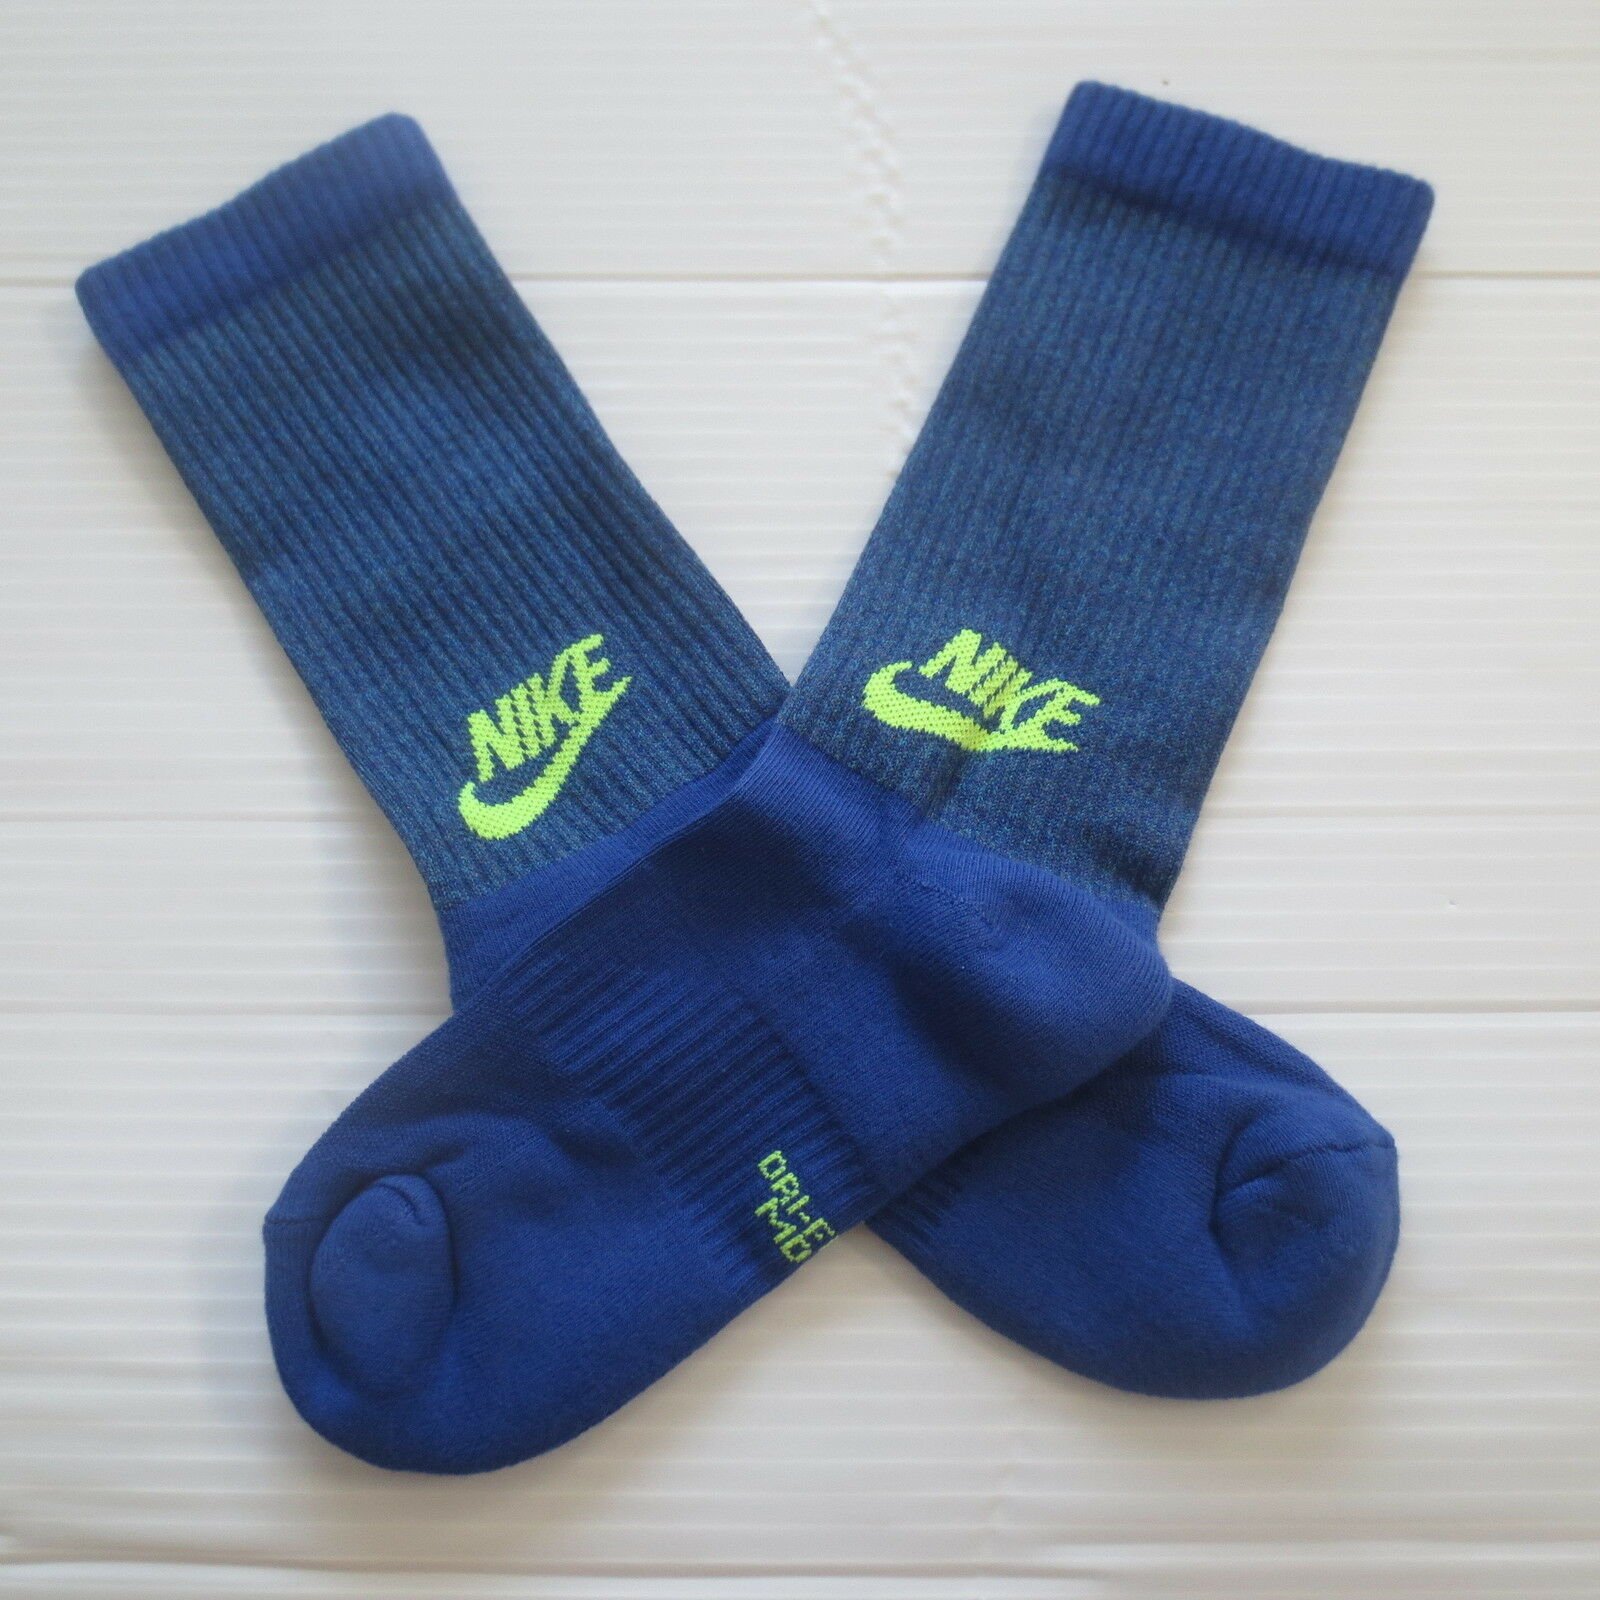 Nike Youth Cushioned Crew Socks - SX6840 - Blue - Size M - NEW